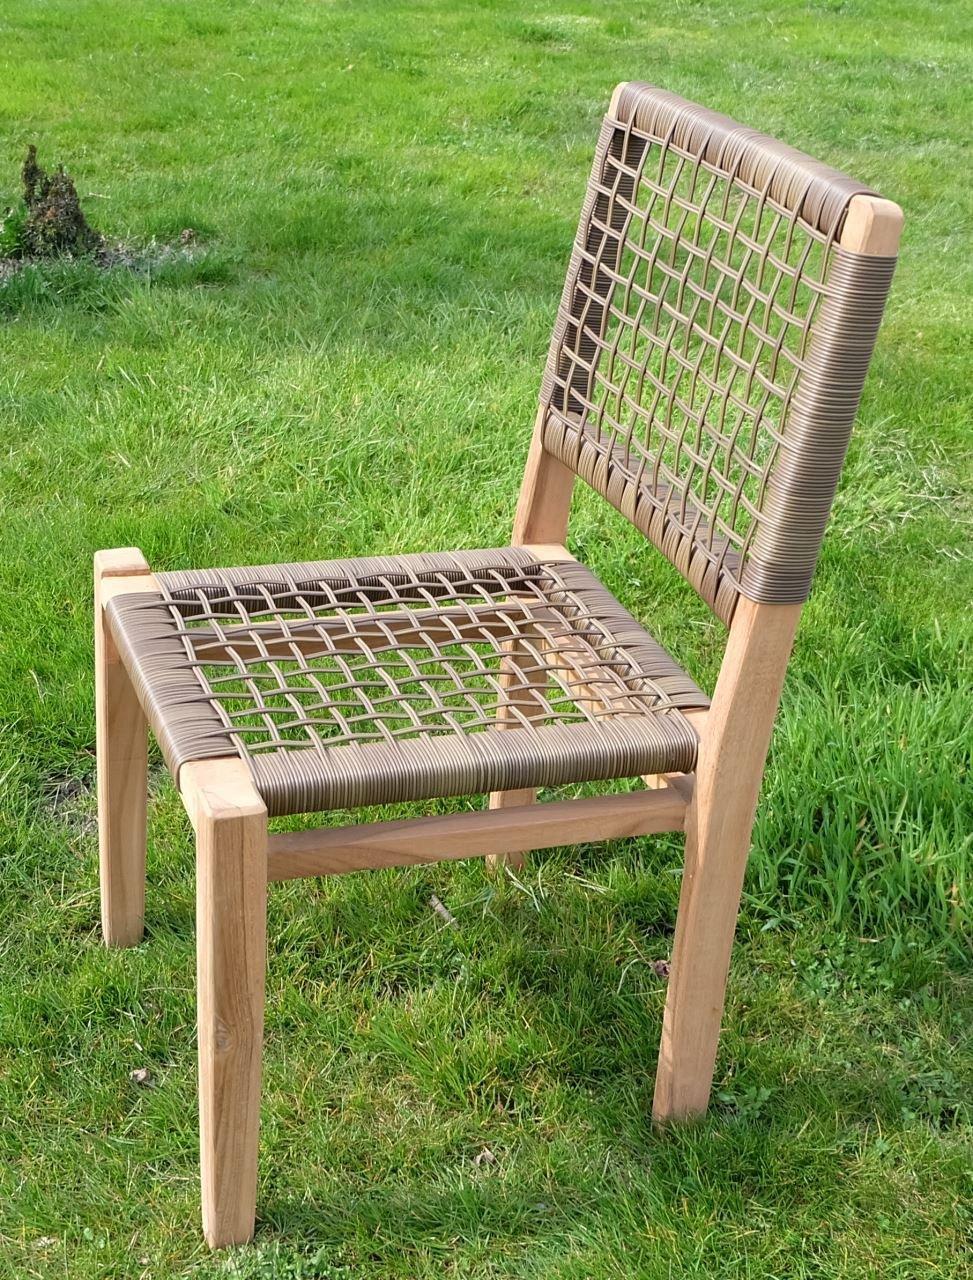 TEAK Design Rattan Sessel Gartensessel Gartenstuhl Sessel Holzsessel Gartenmöbel Holz geölt sehr robust Modell: RIO von AS-S günstig